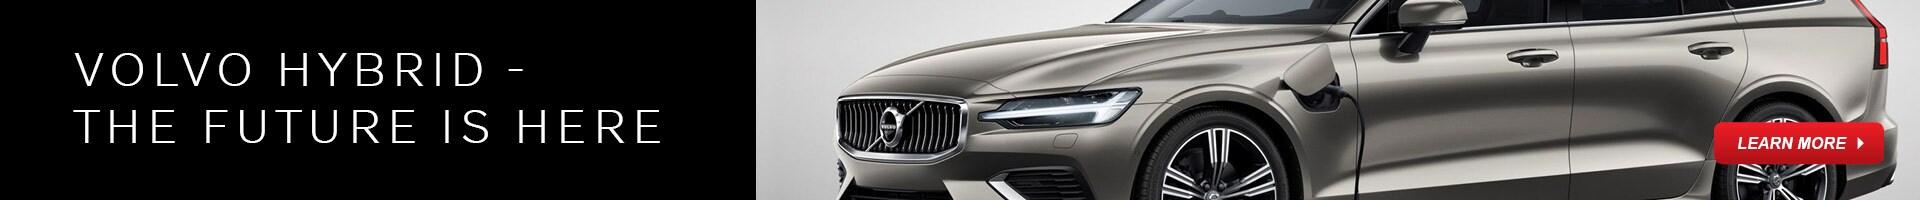 Volvo Dealership Near Me >> Jim Pattison Volvo Of Surrey New Used Volvo Dealership